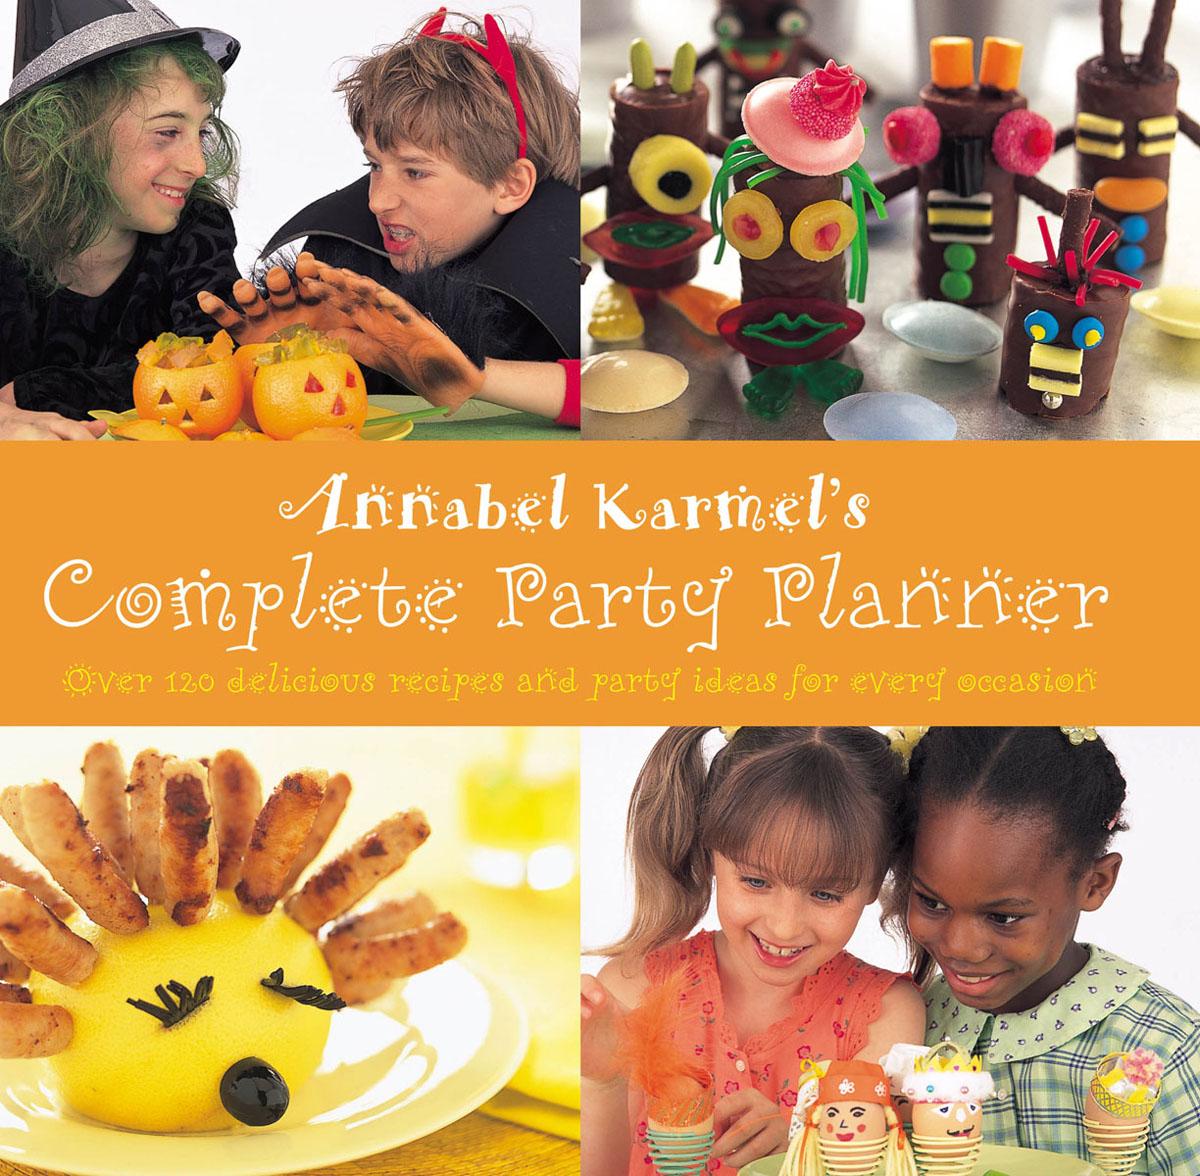 Karmel, Annabel. Annabel Karmel's Complete Party Planner